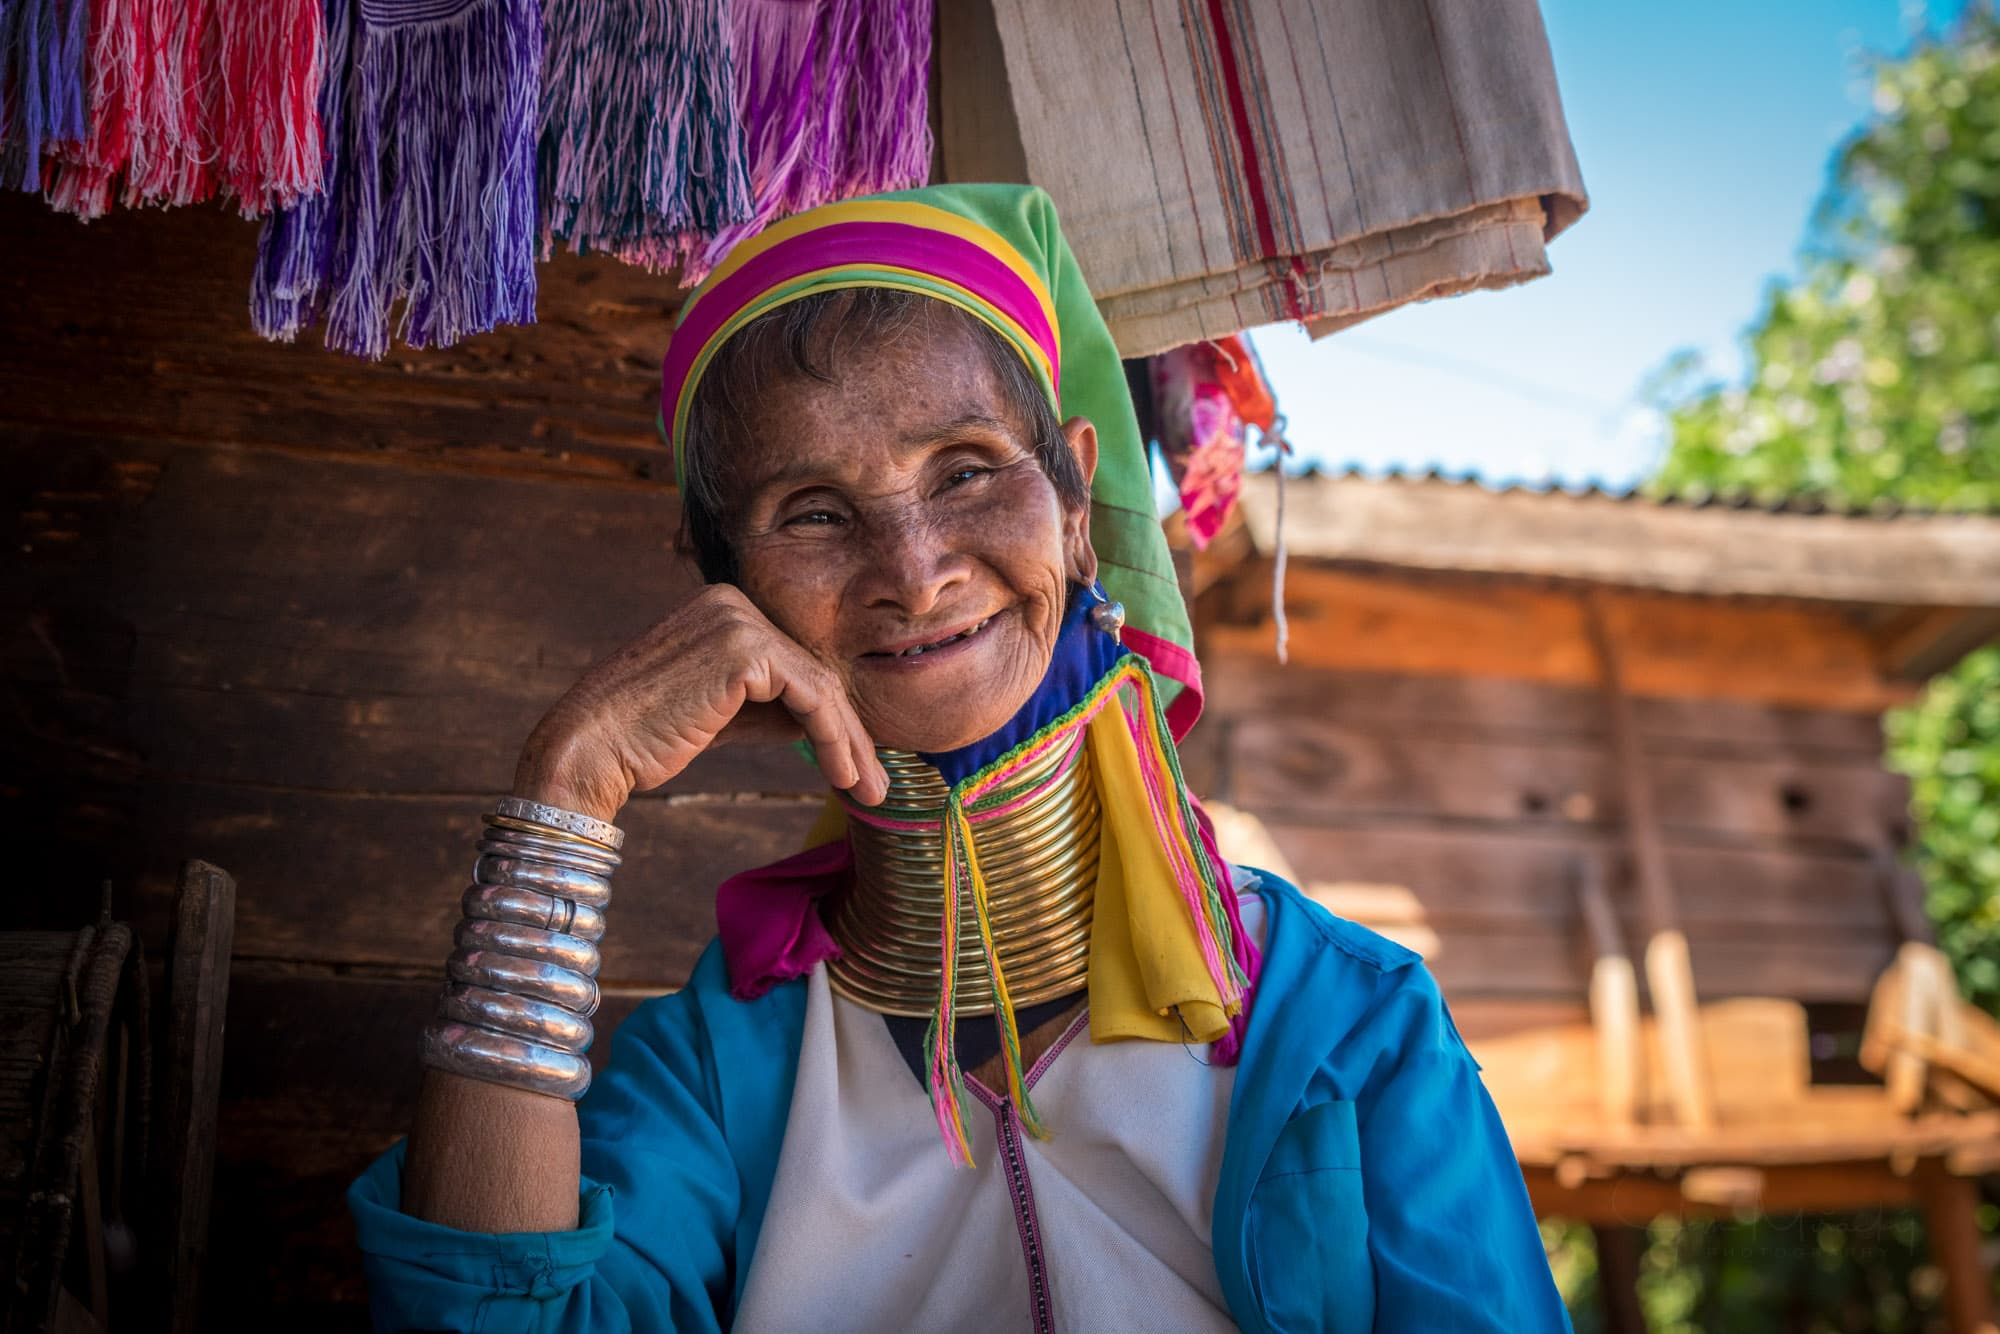 Old woman from Kayan (Padaung, Long-neck) tribe